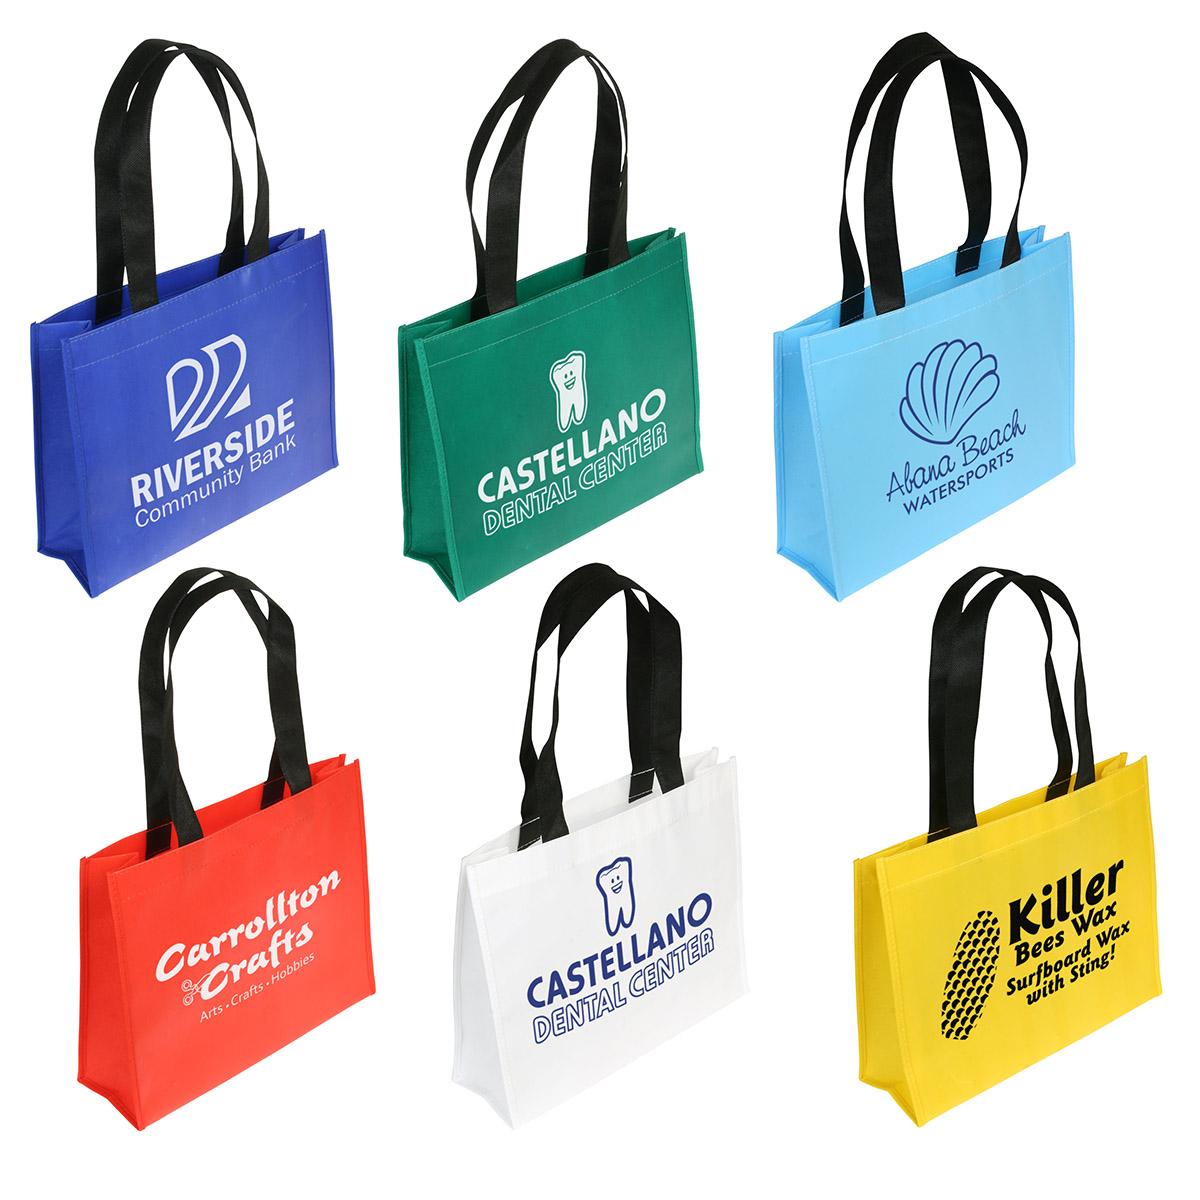 Raindance Water Resistant Coated Tote Bag, WBA-RD09 - 1 Colour Imprint